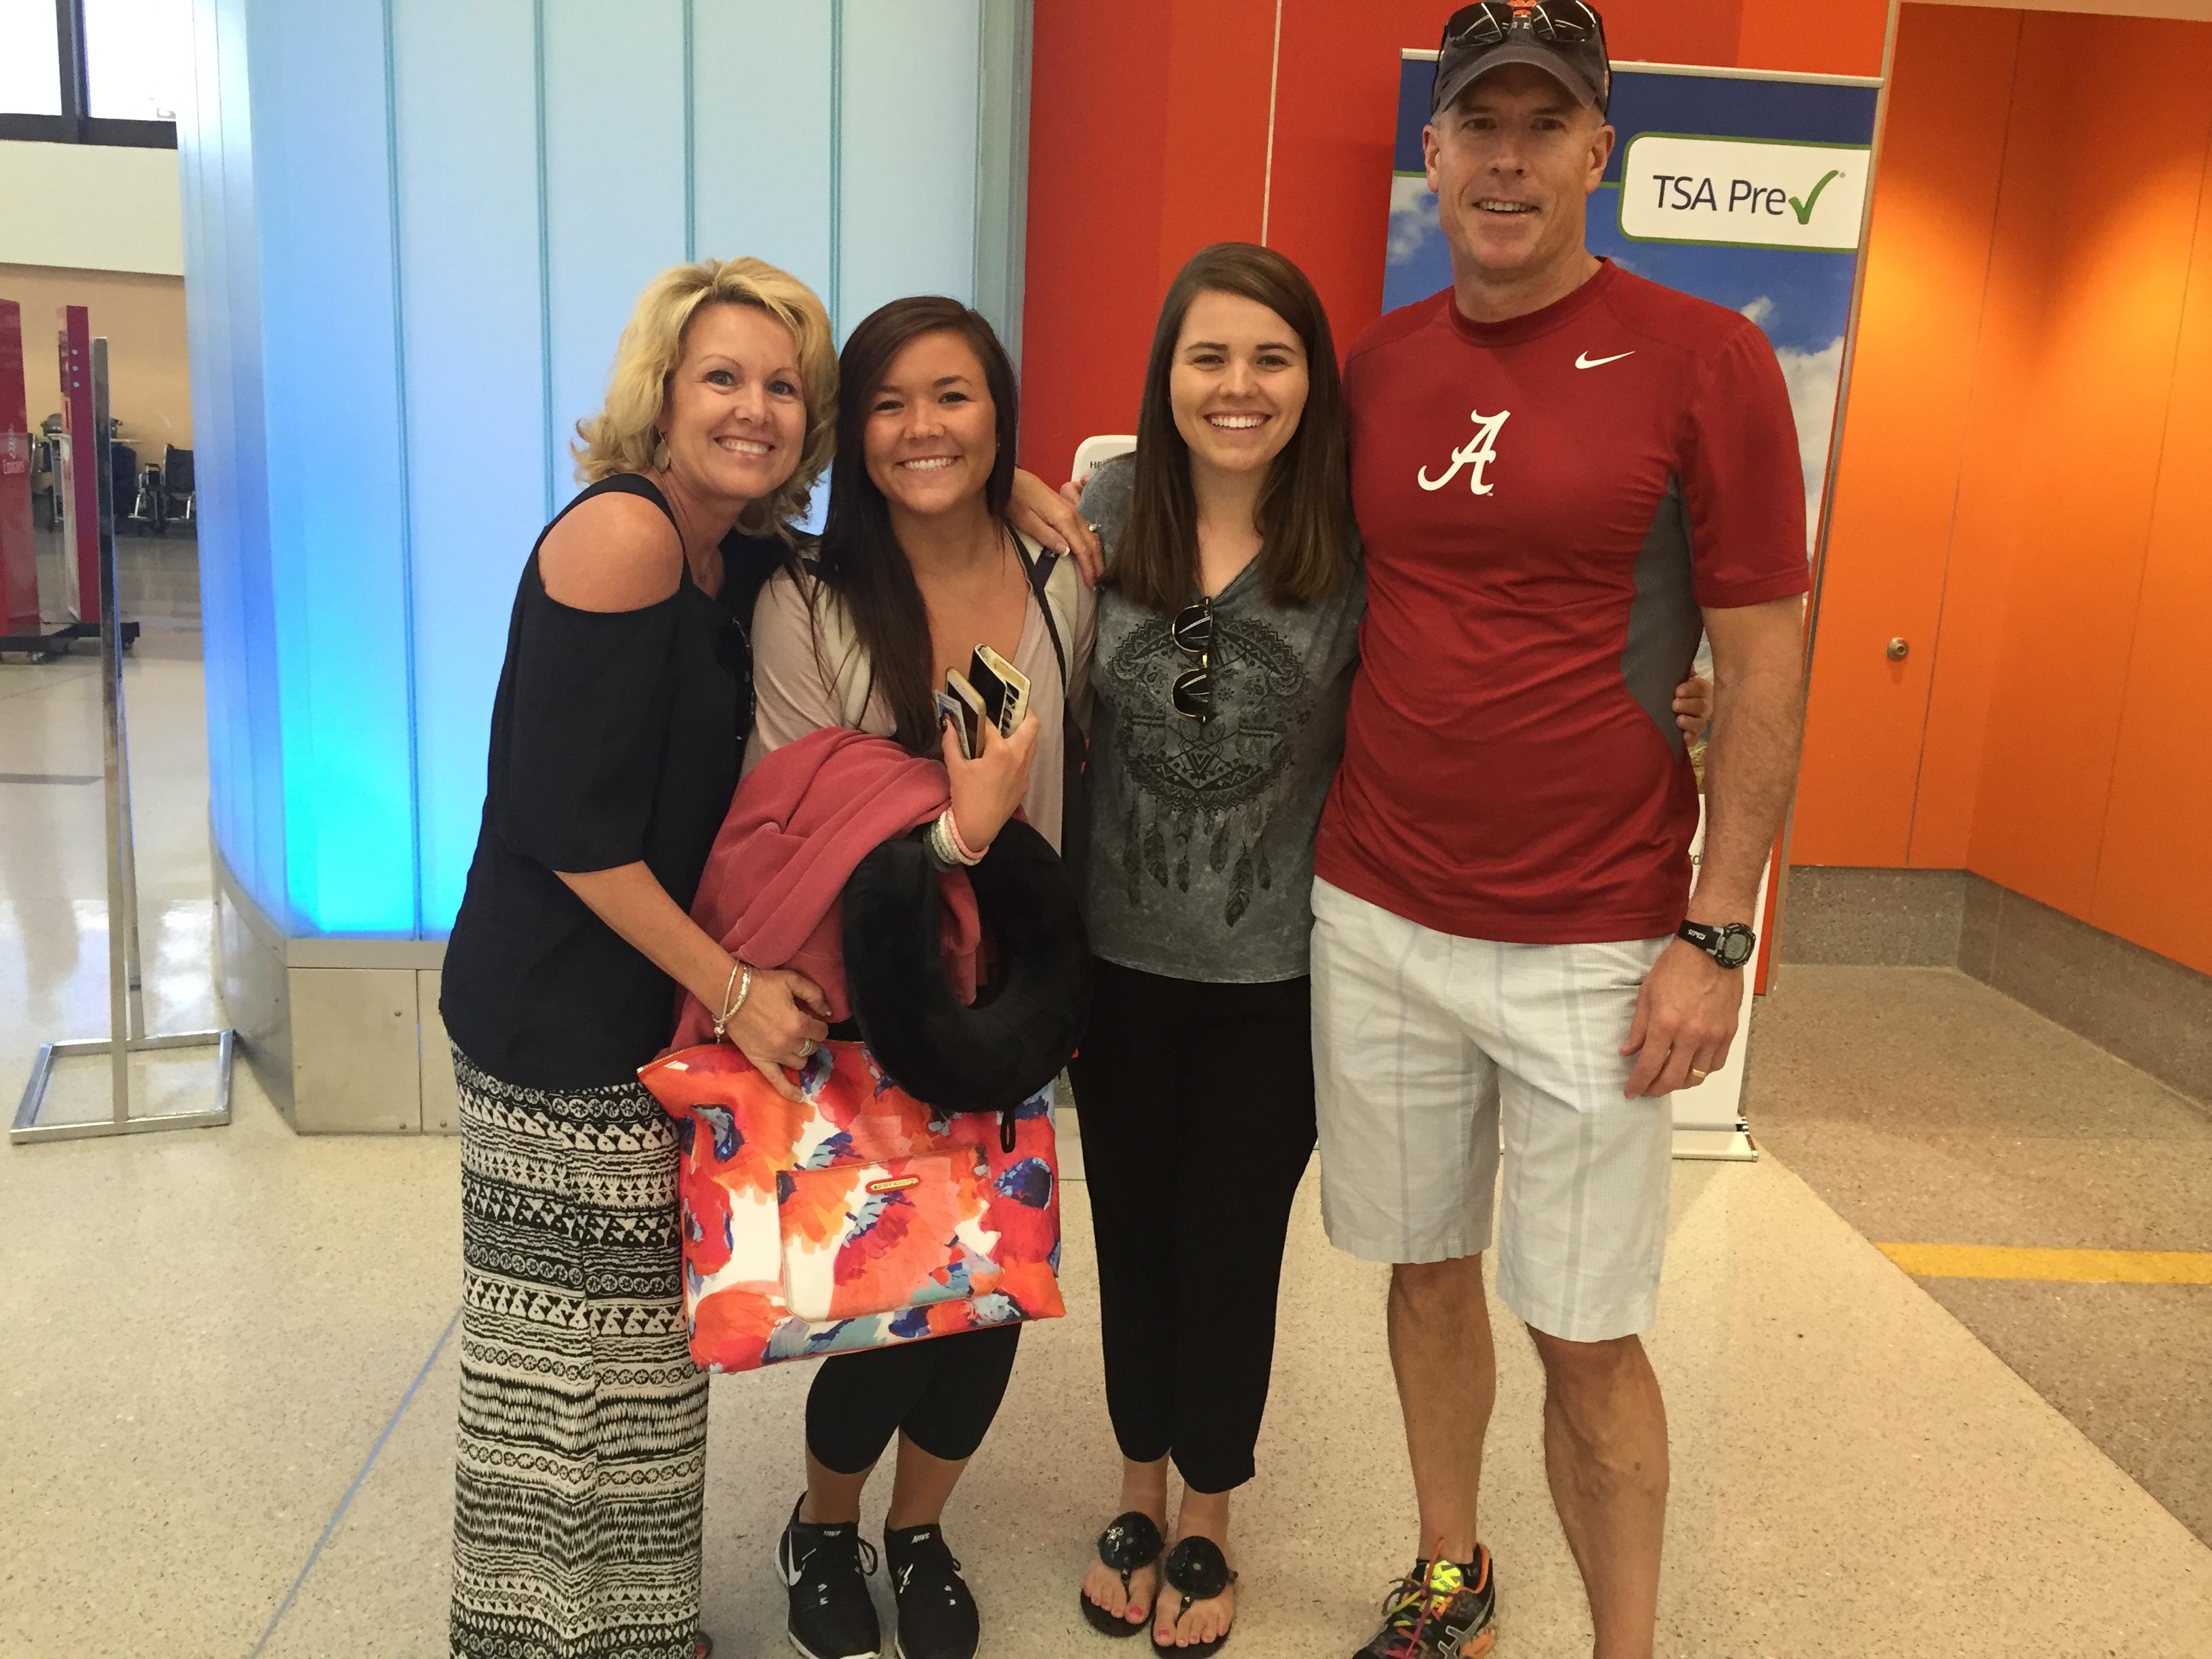 Peyton Heller family